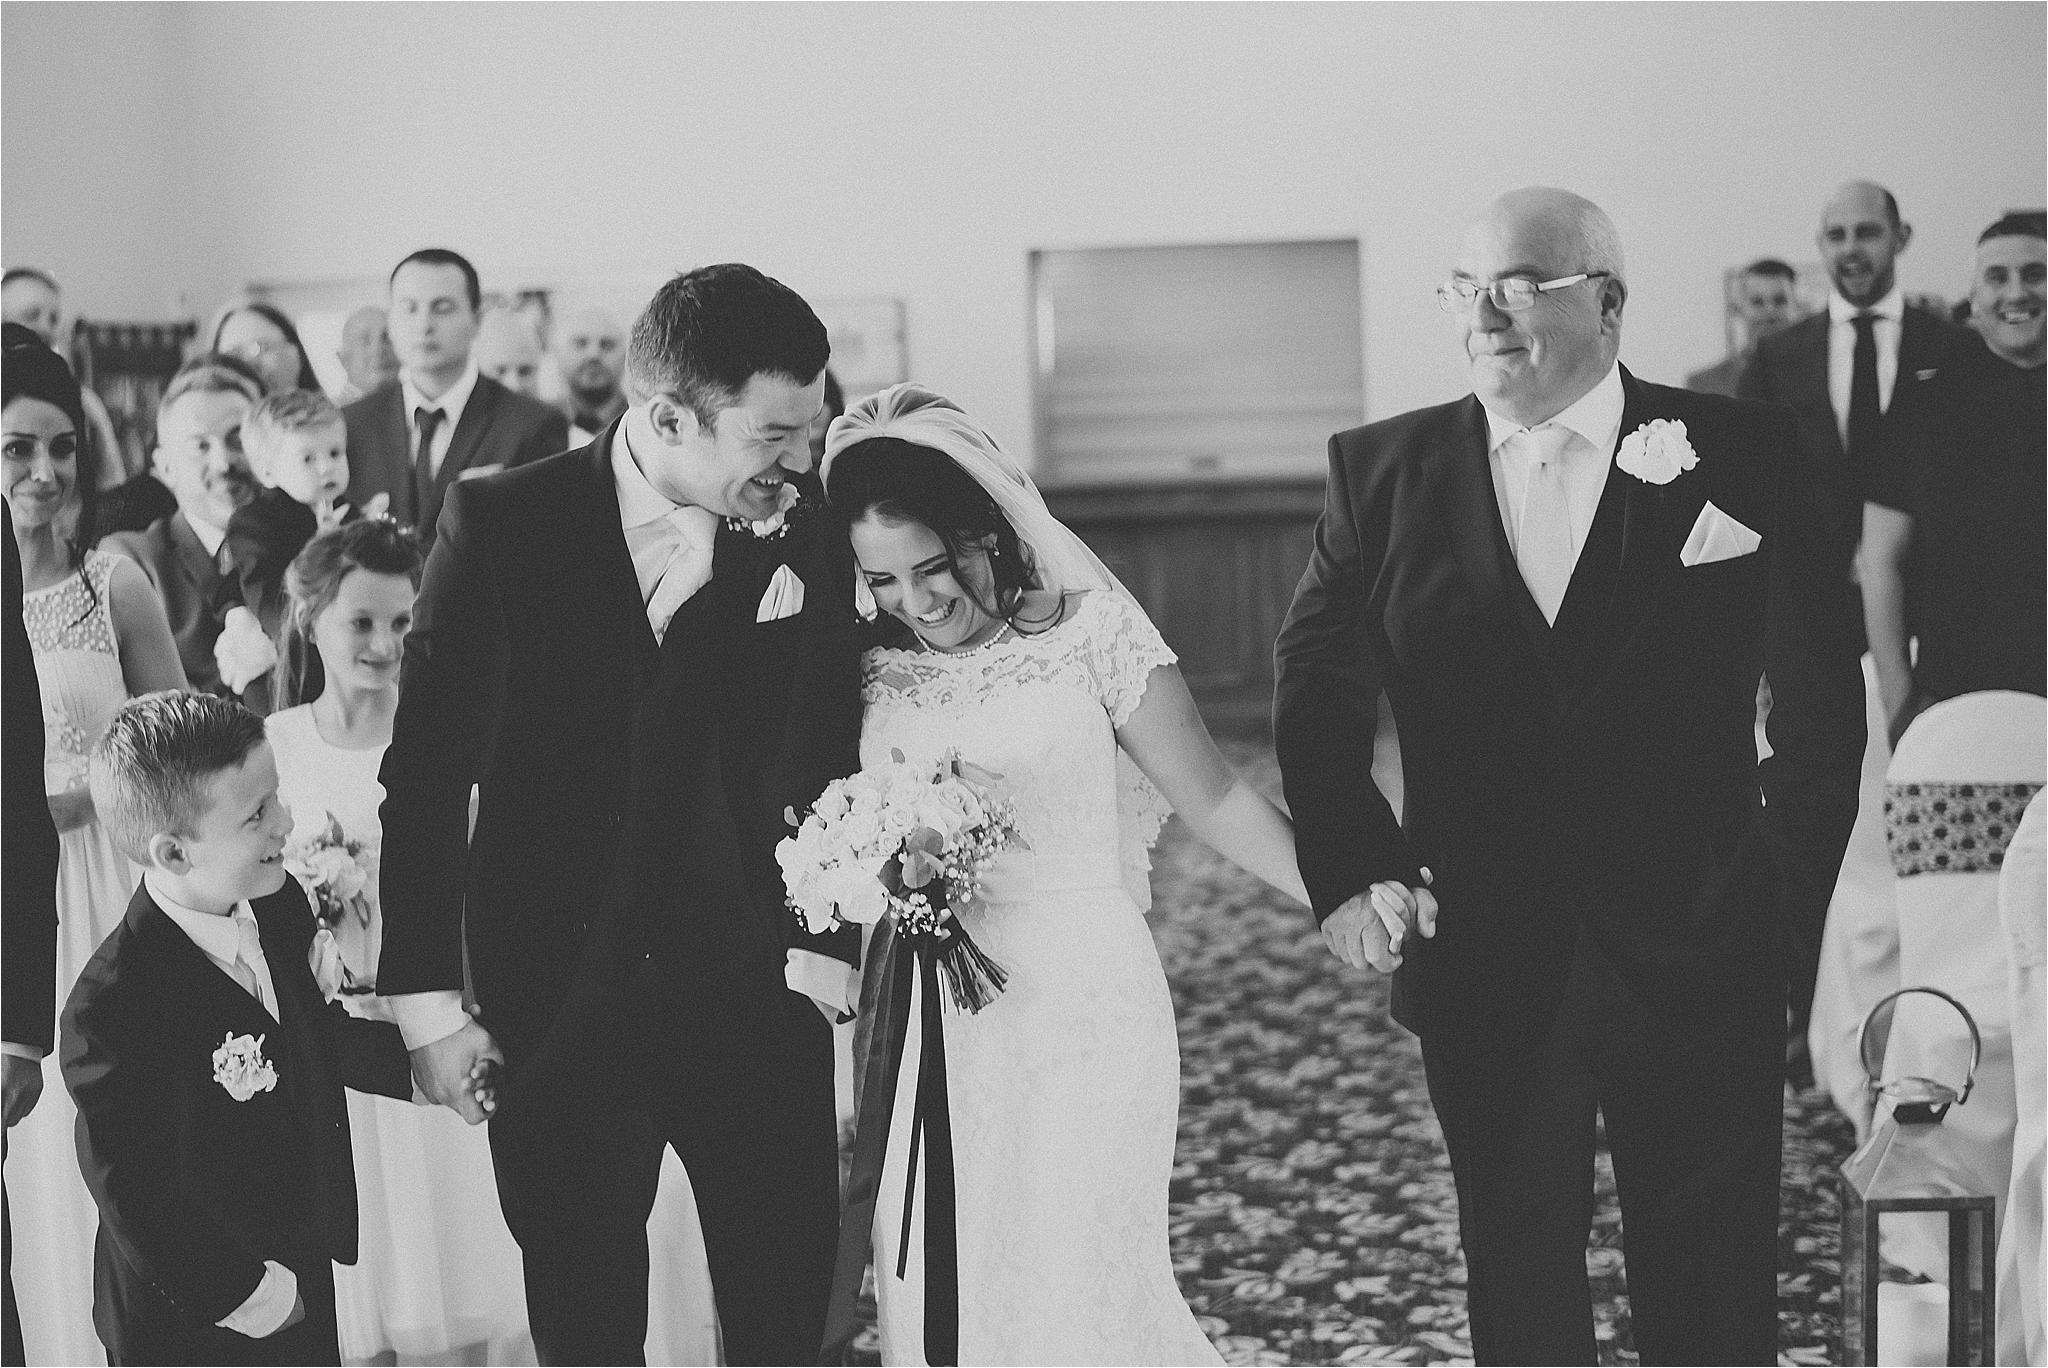 thevilla+lancashire+wreagreen+wedding+photographer22.jpg